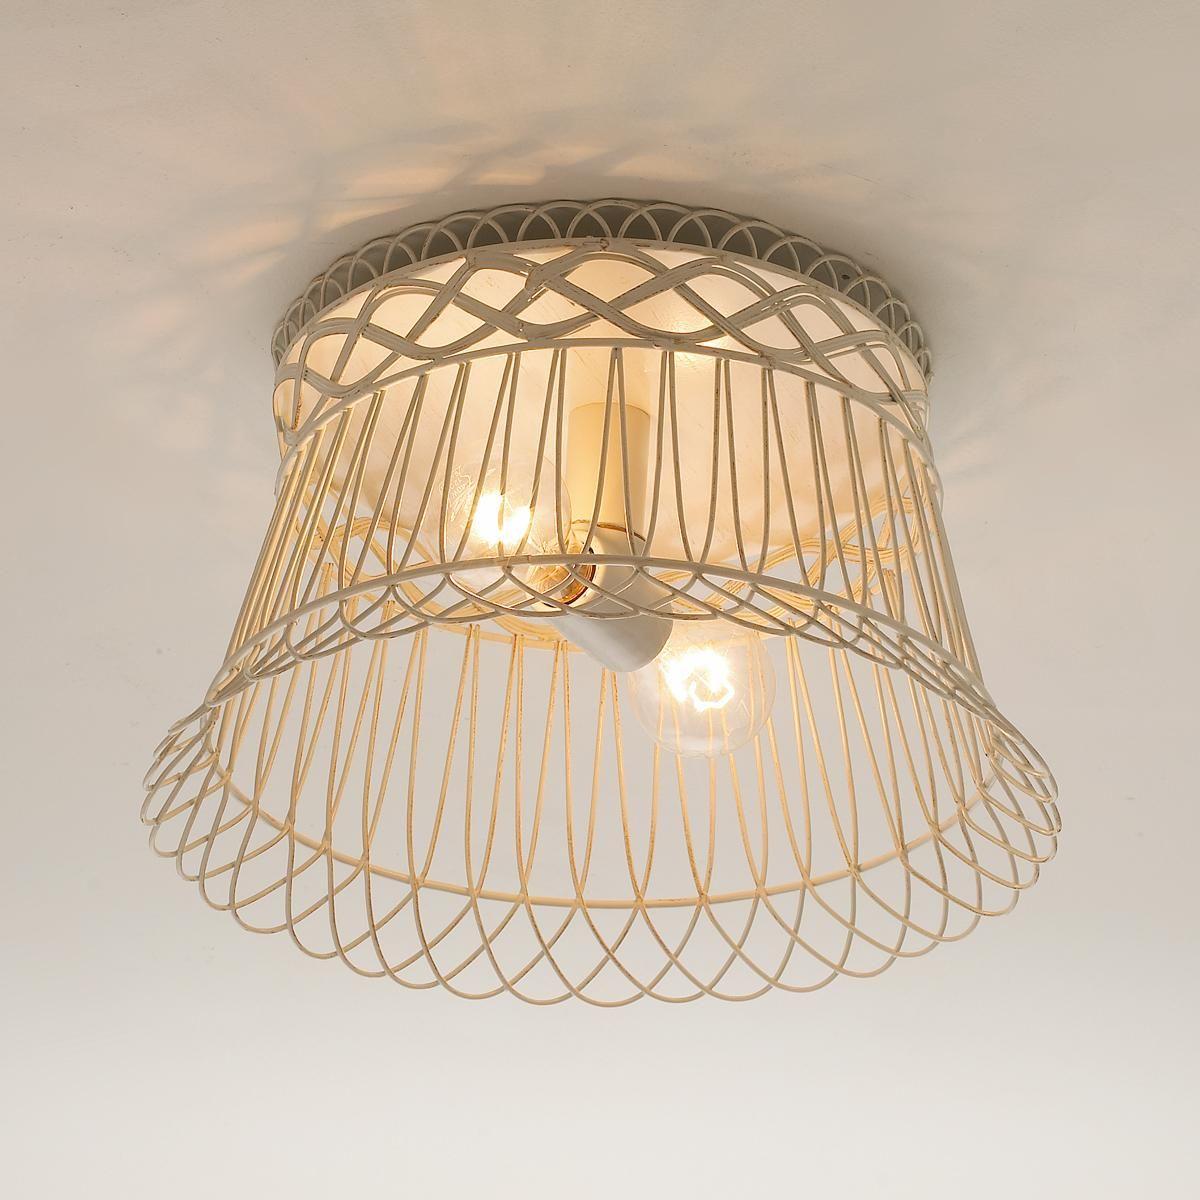 vintage wire basket ceiling light shades of light 149 i want to make one lampor och. Black Bedroom Furniture Sets. Home Design Ideas